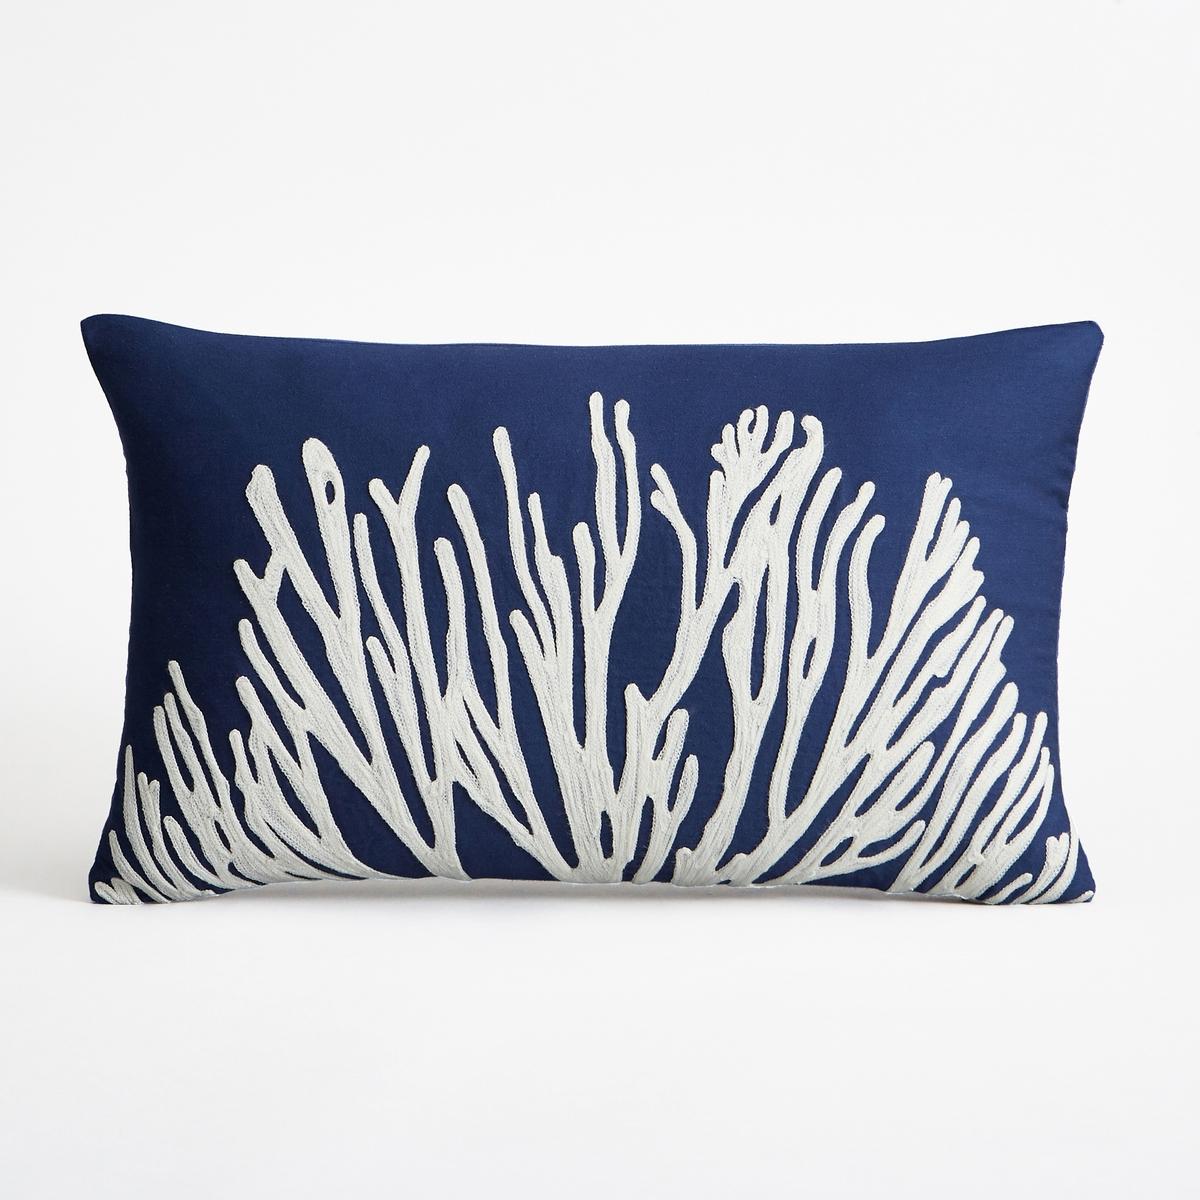 Наволочка на подушку-валик, Mariana<br><br>Цвет: синий морской<br>Размер: 50 x 30 см